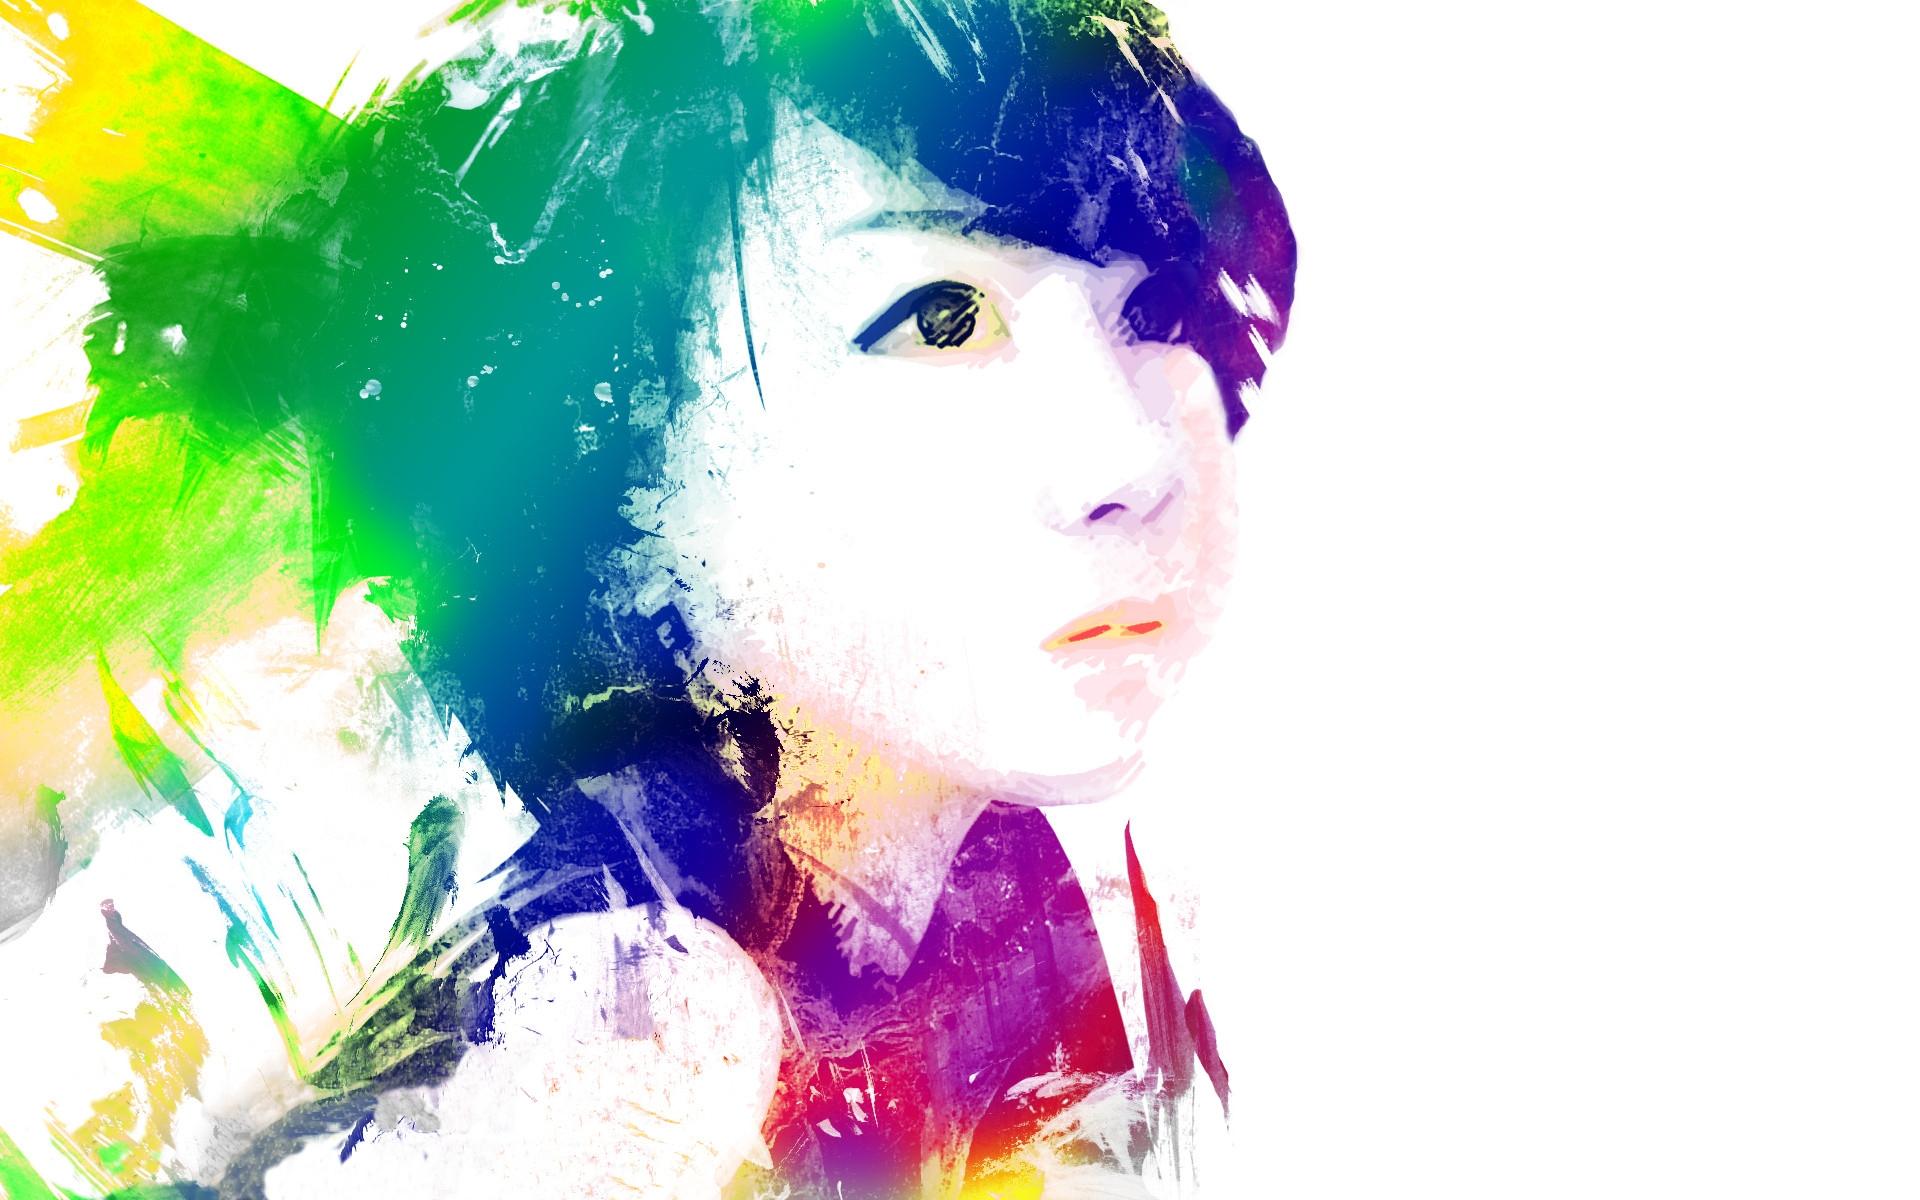 Masaüstü Renkli Illüstrasyon Portre Mor Siyah Saç Grafik